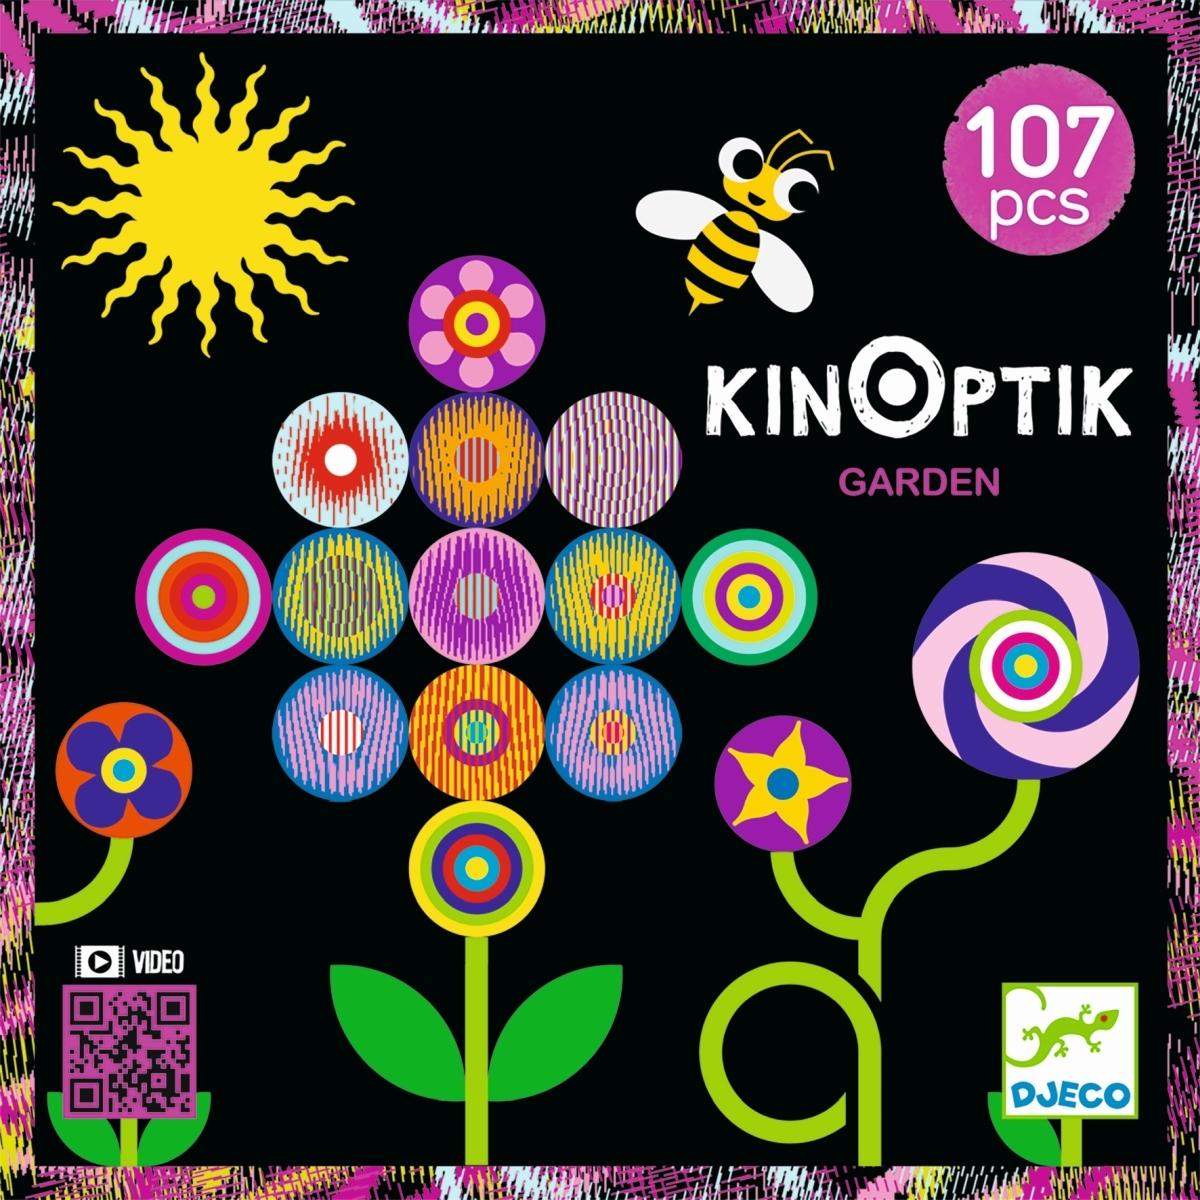 Djeco - Kinoptic Garden